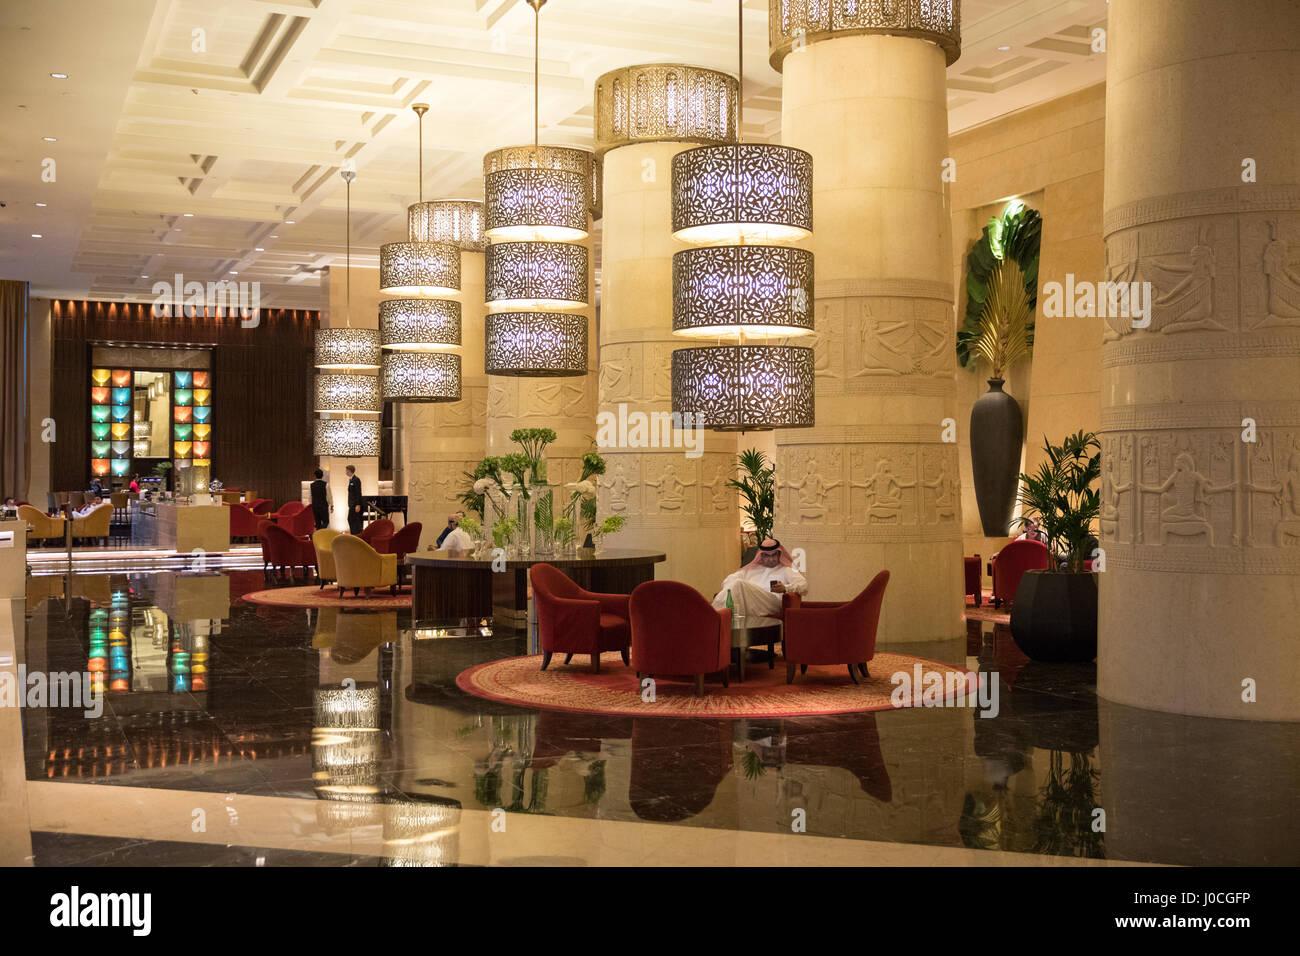 The Raffles hotel in Dubai - Stock Image